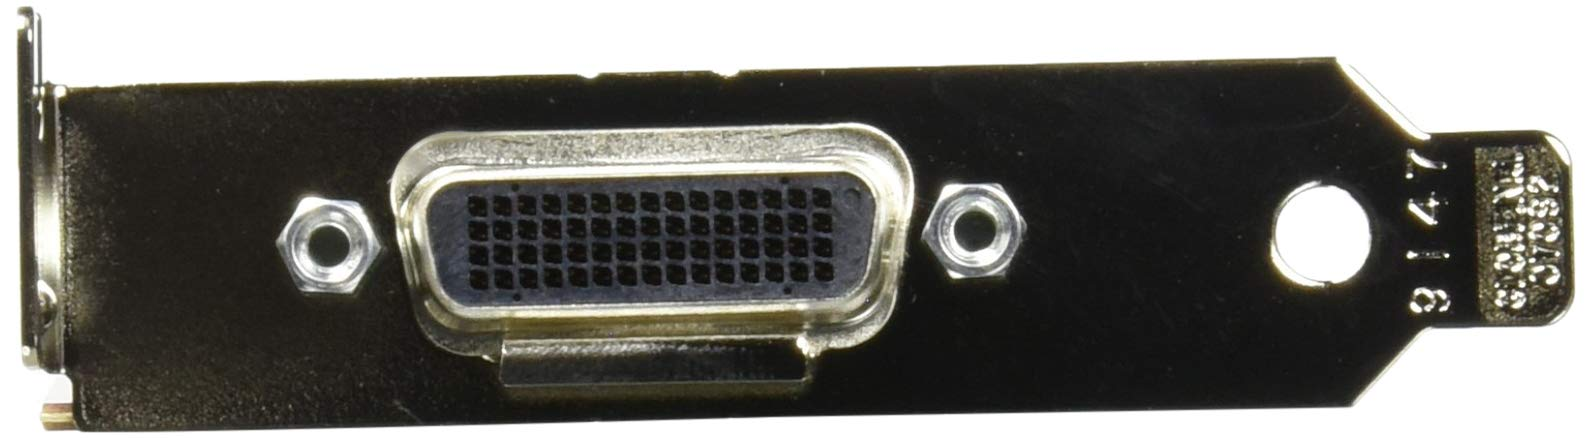 30137-0 ROCKETPORT PCIE 16PORT RS232//422//485 EXPRESS COMTROL CORP